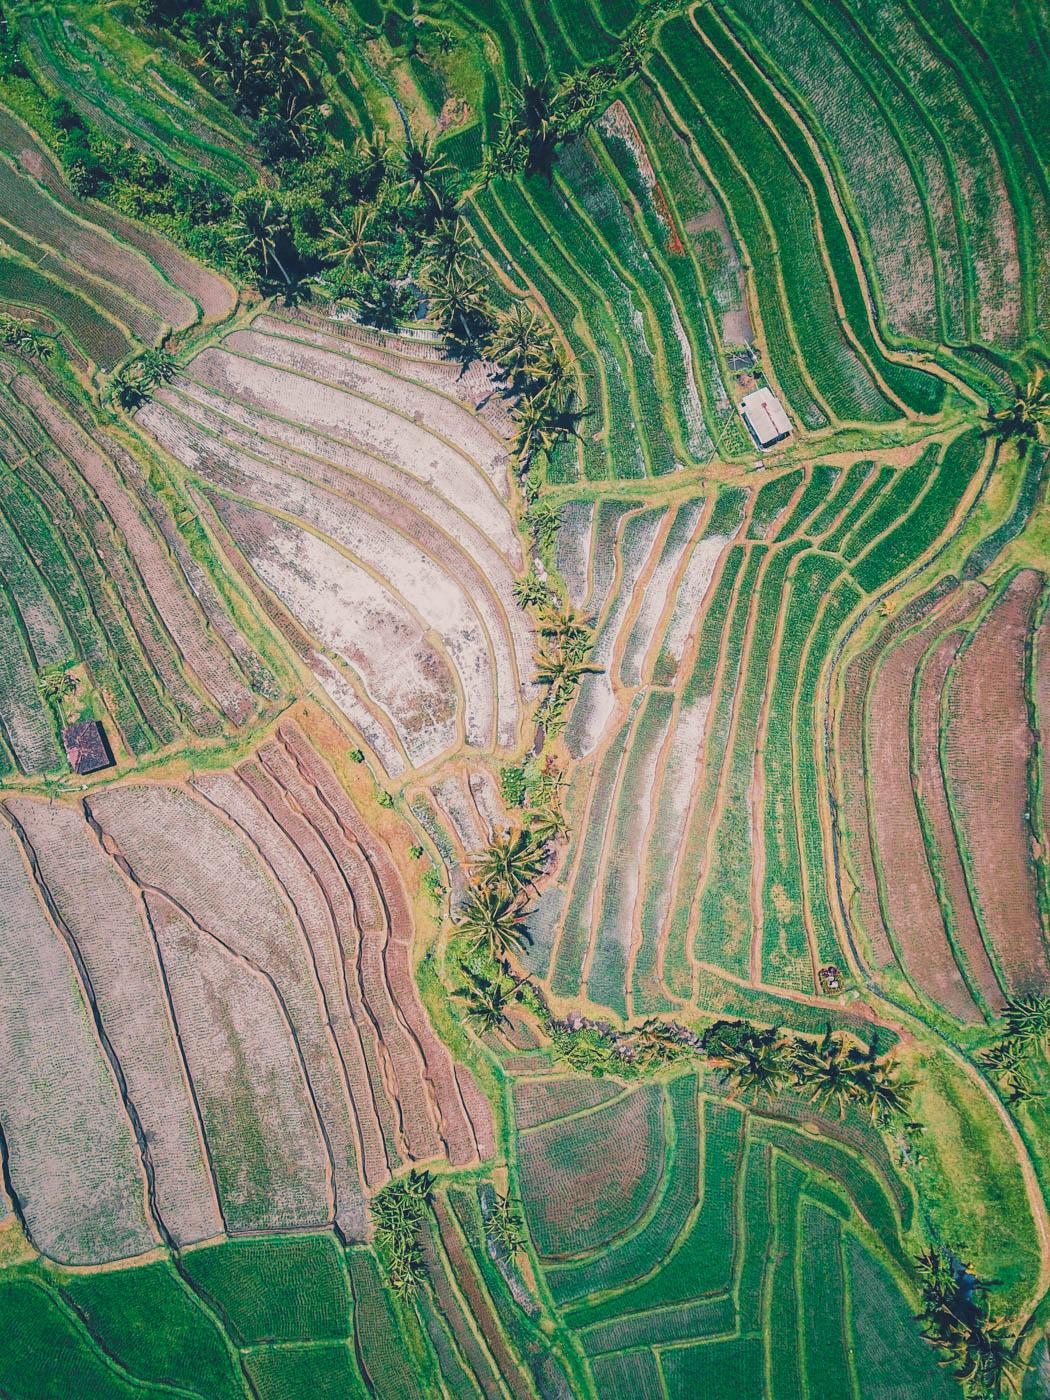 Jatiluwih Rice Terraces, Bali #dronephotography #travel